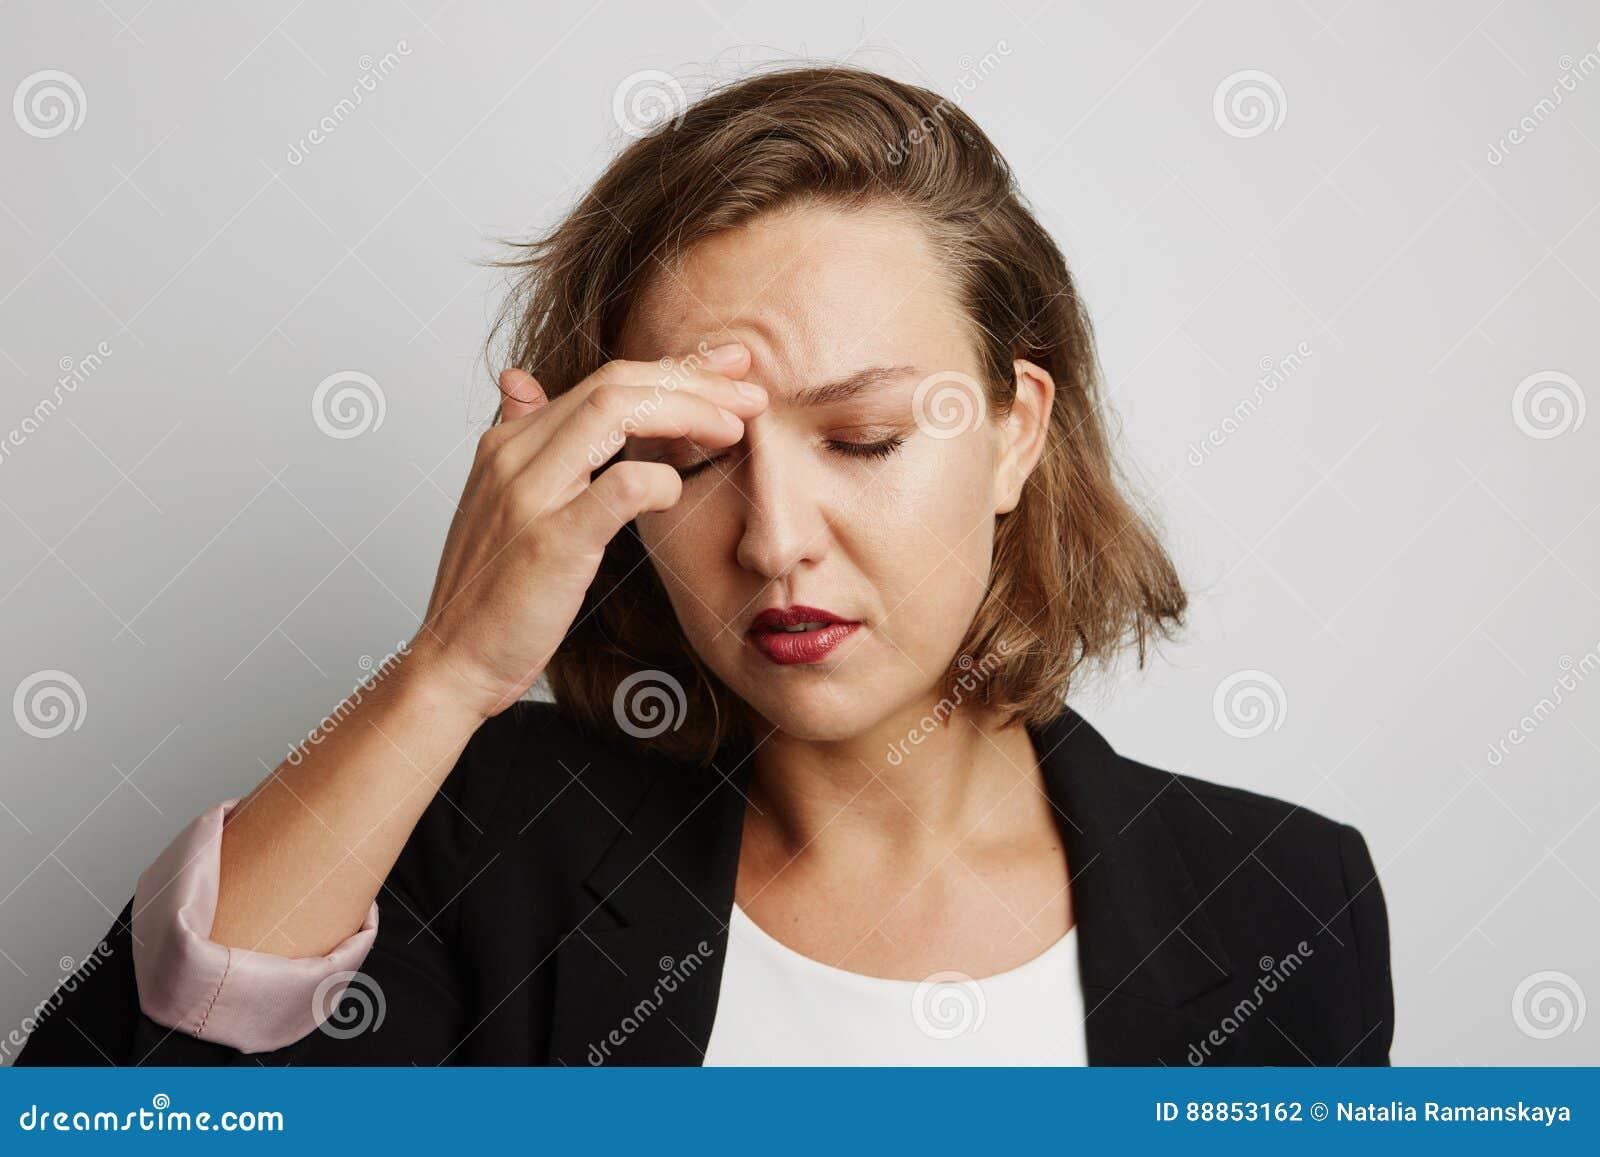 Den unga affärskvinnan gjorde ett fel, studiofoto på en vit bakgrund